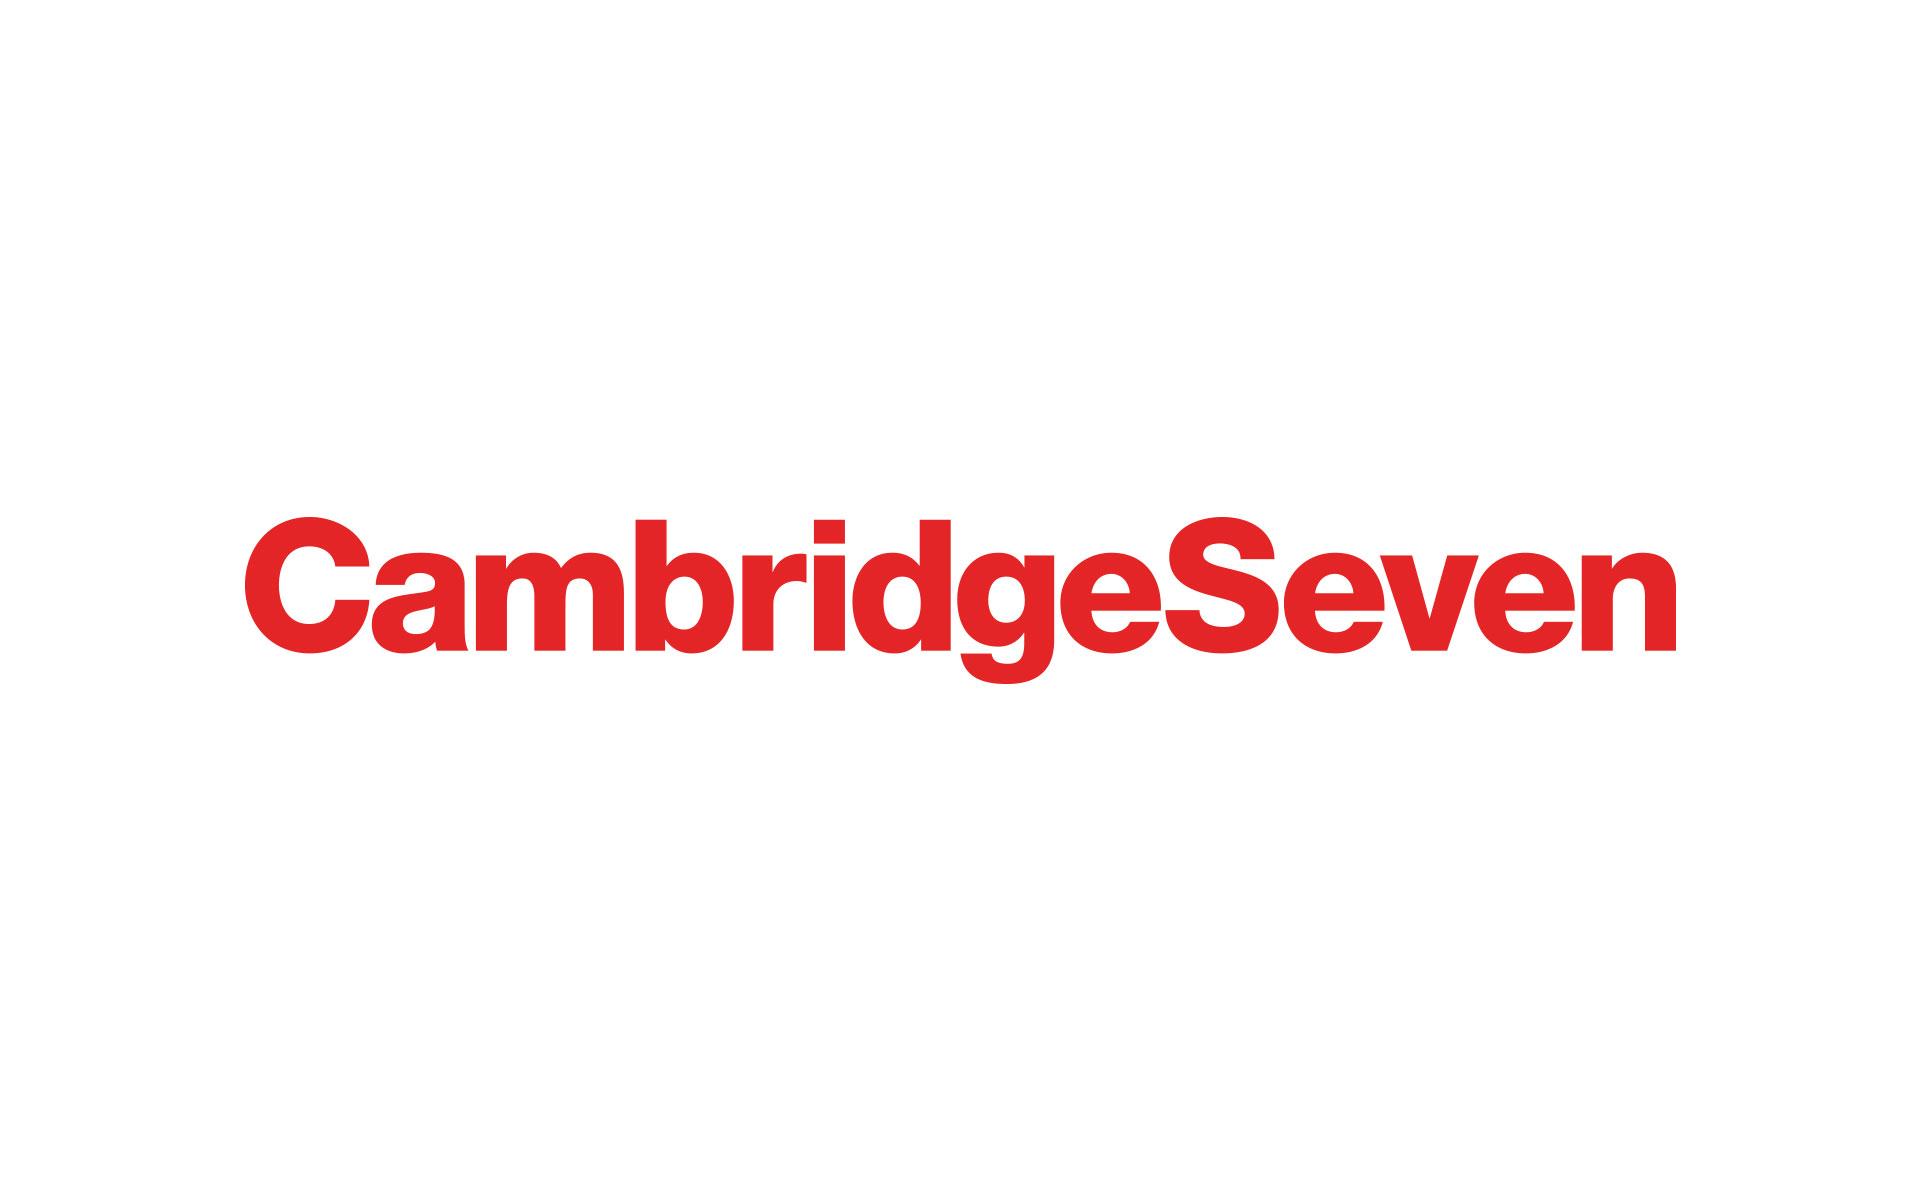 CambridgeSeven Logotype design